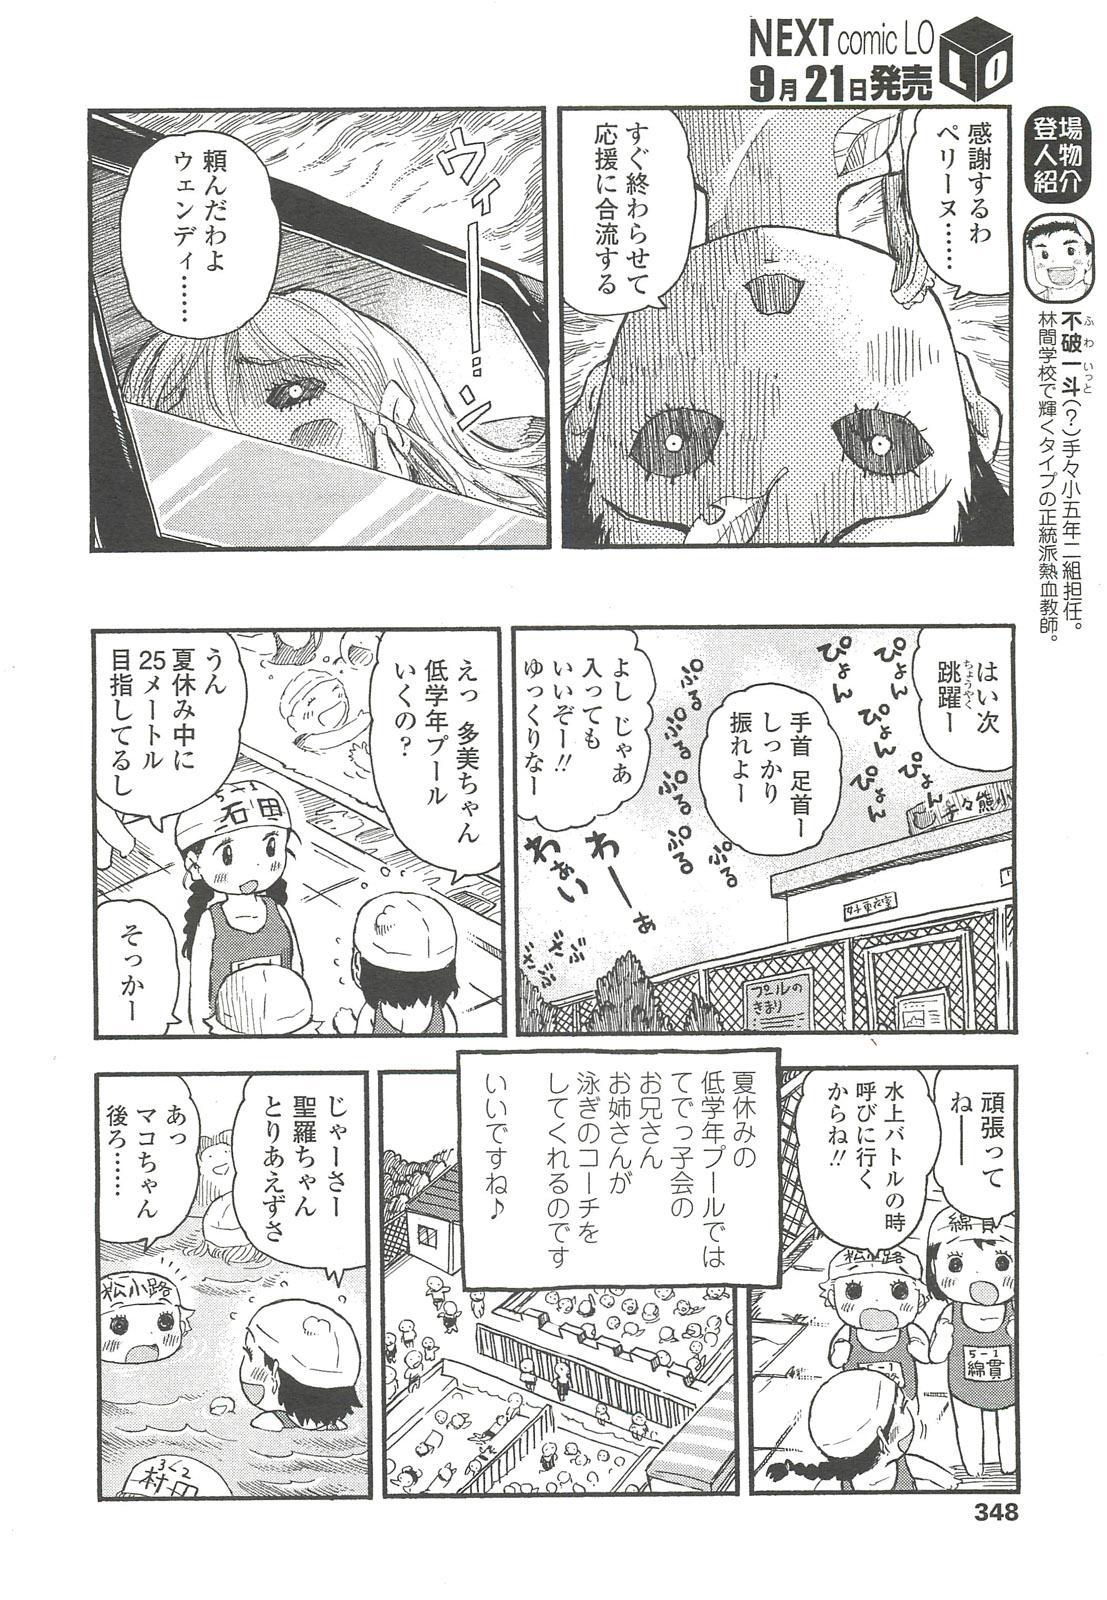 COMIC LO 2010-10 Vol. 79 346